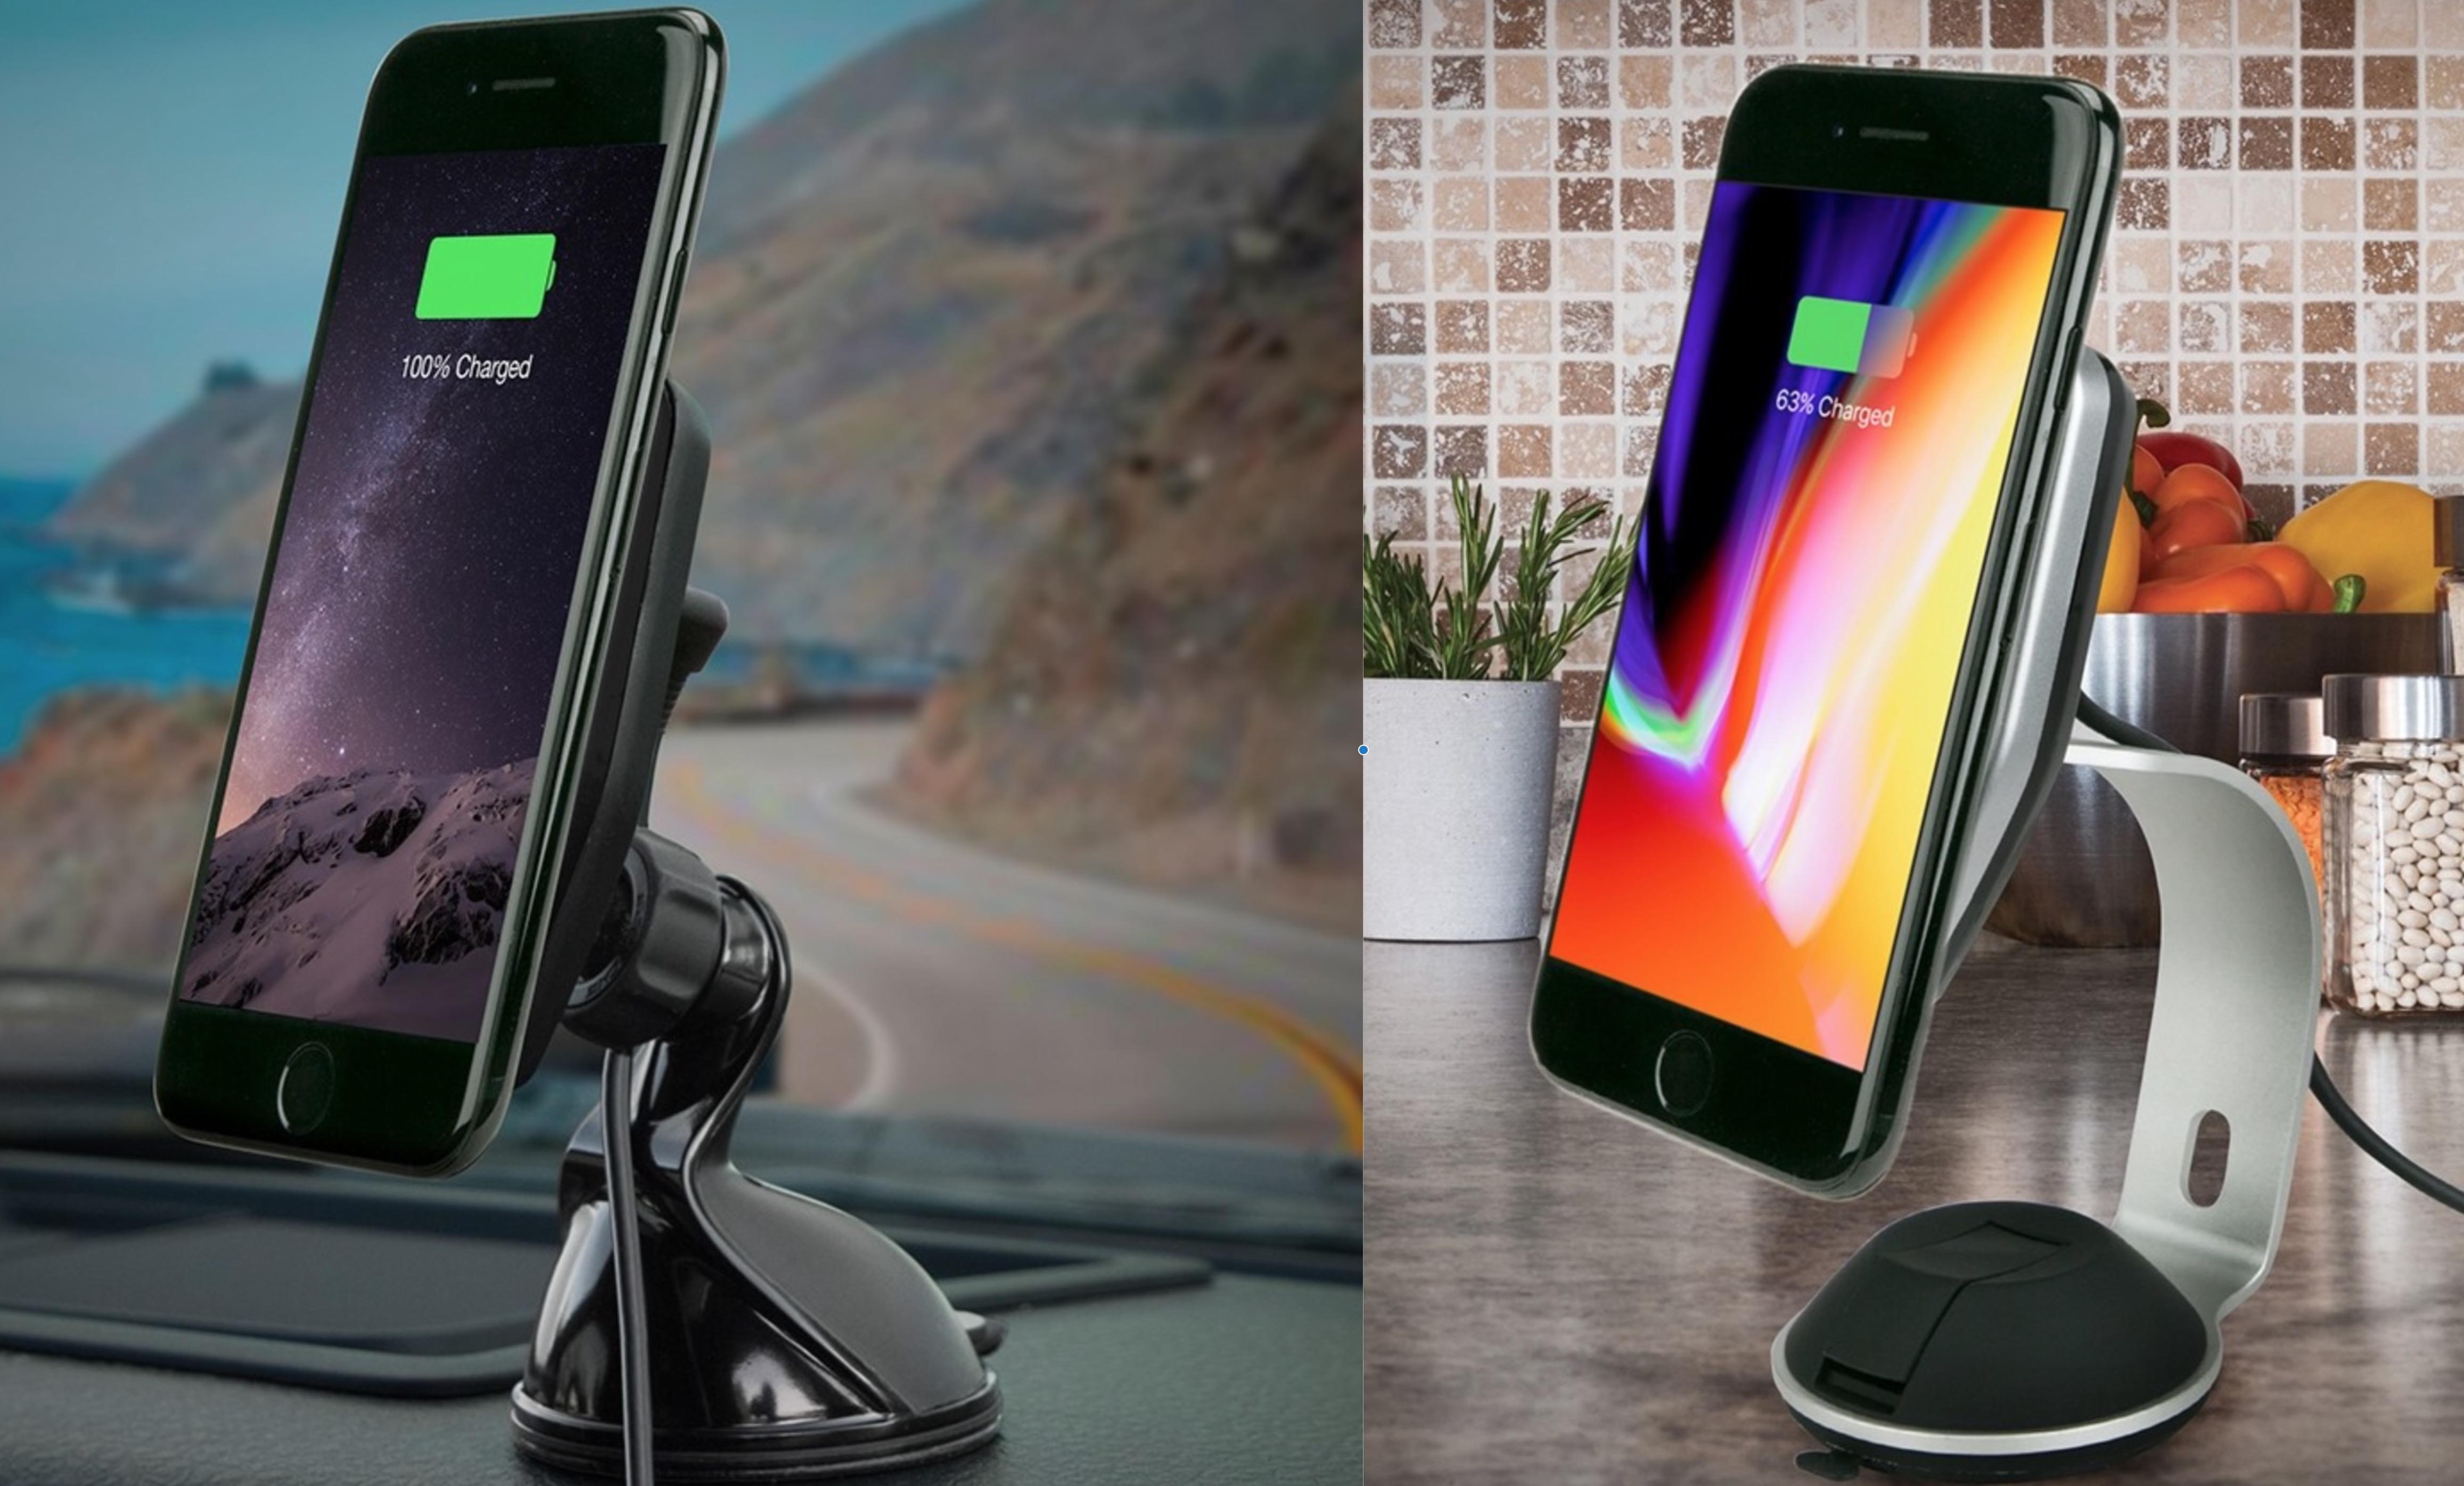 Iphone 8 windscreen mount